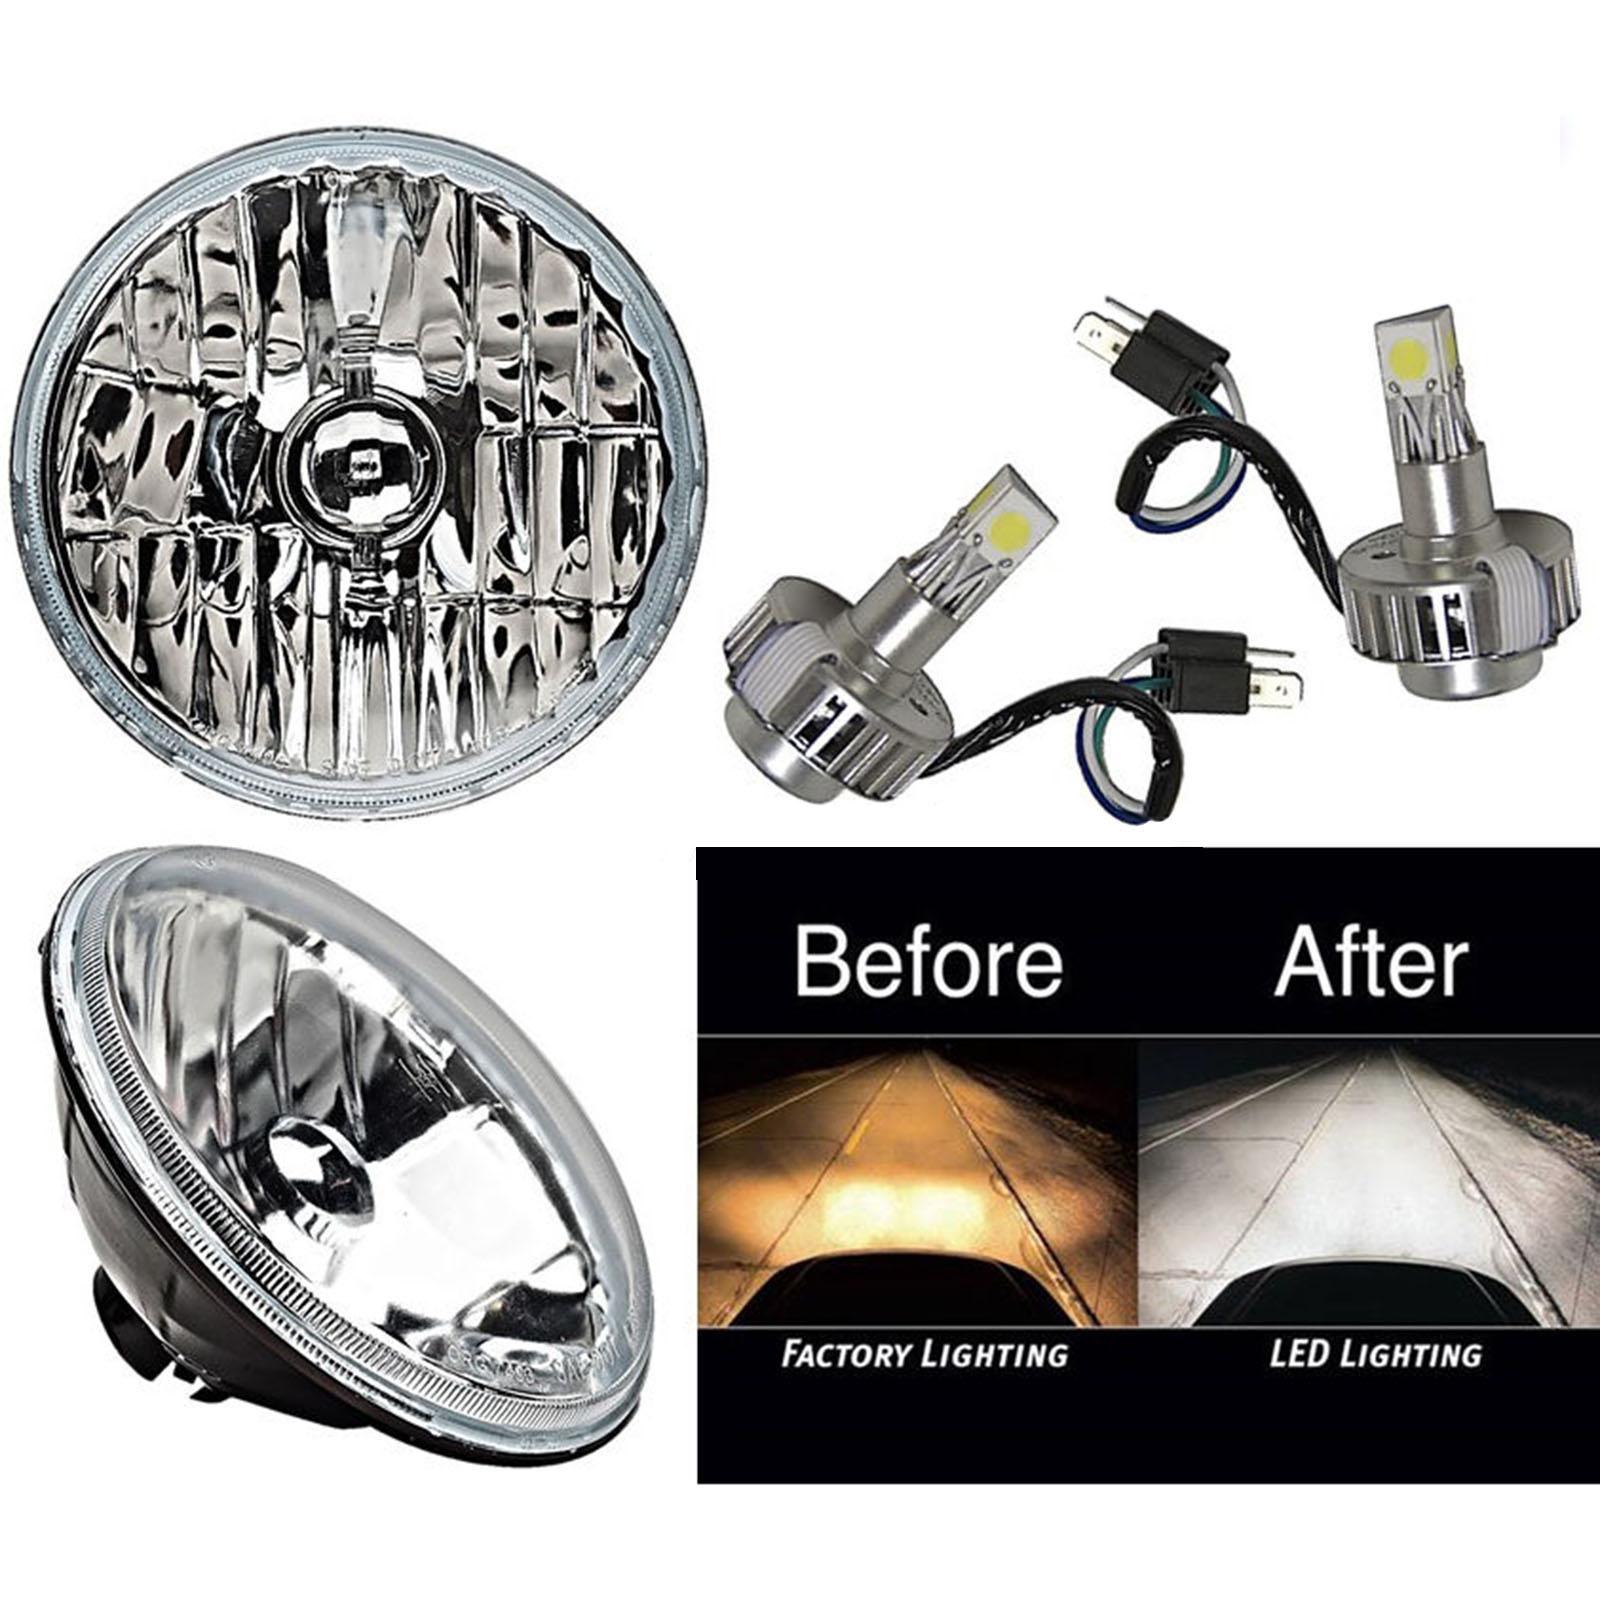 7 Crystal Glass Metal Headlight Smd Cob 360 Led Light Bulb Headlamp Pair Ebay